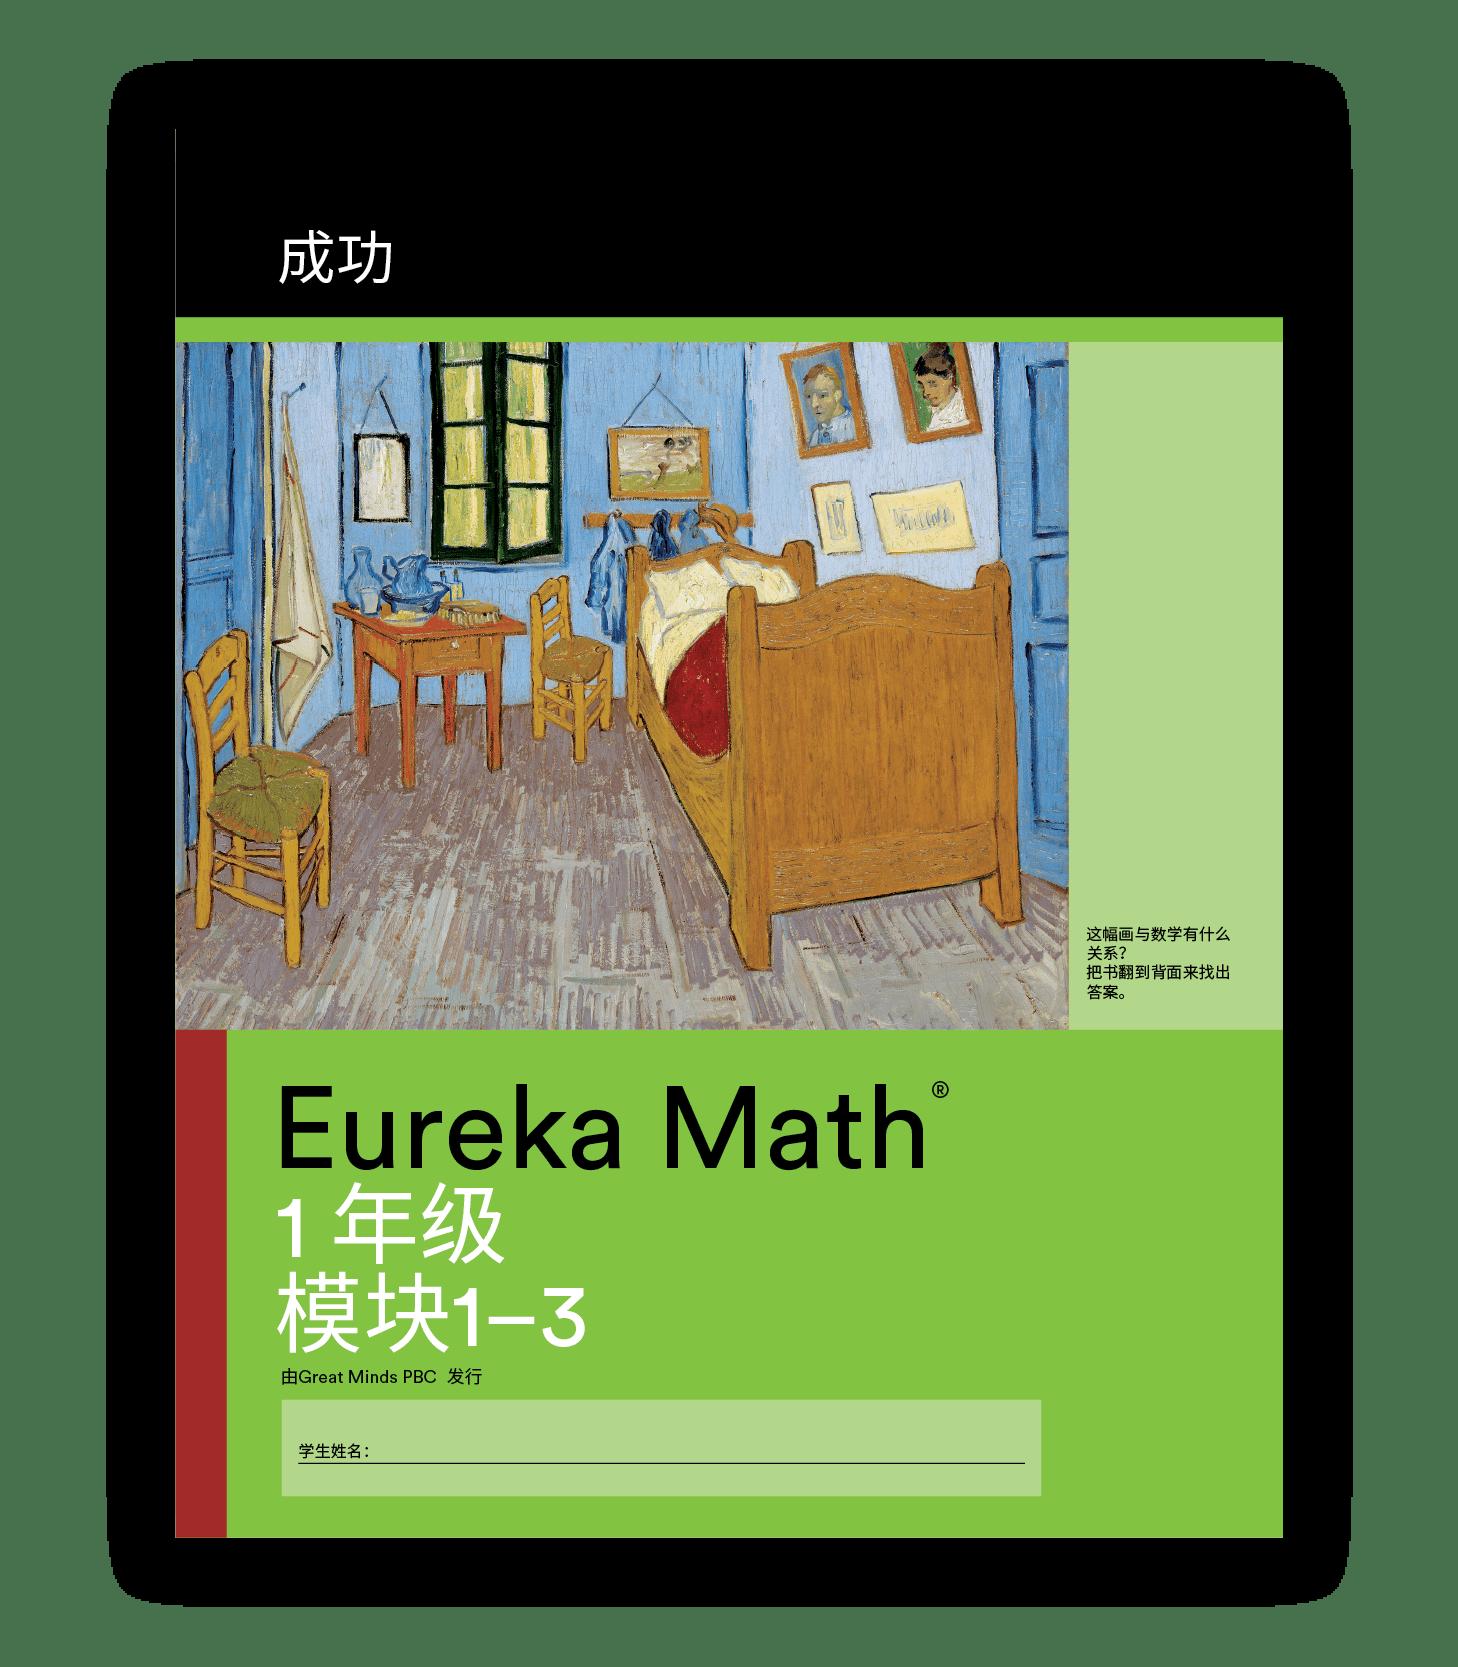 Eureka Math Succeed Book in Mandarin for Grade 1